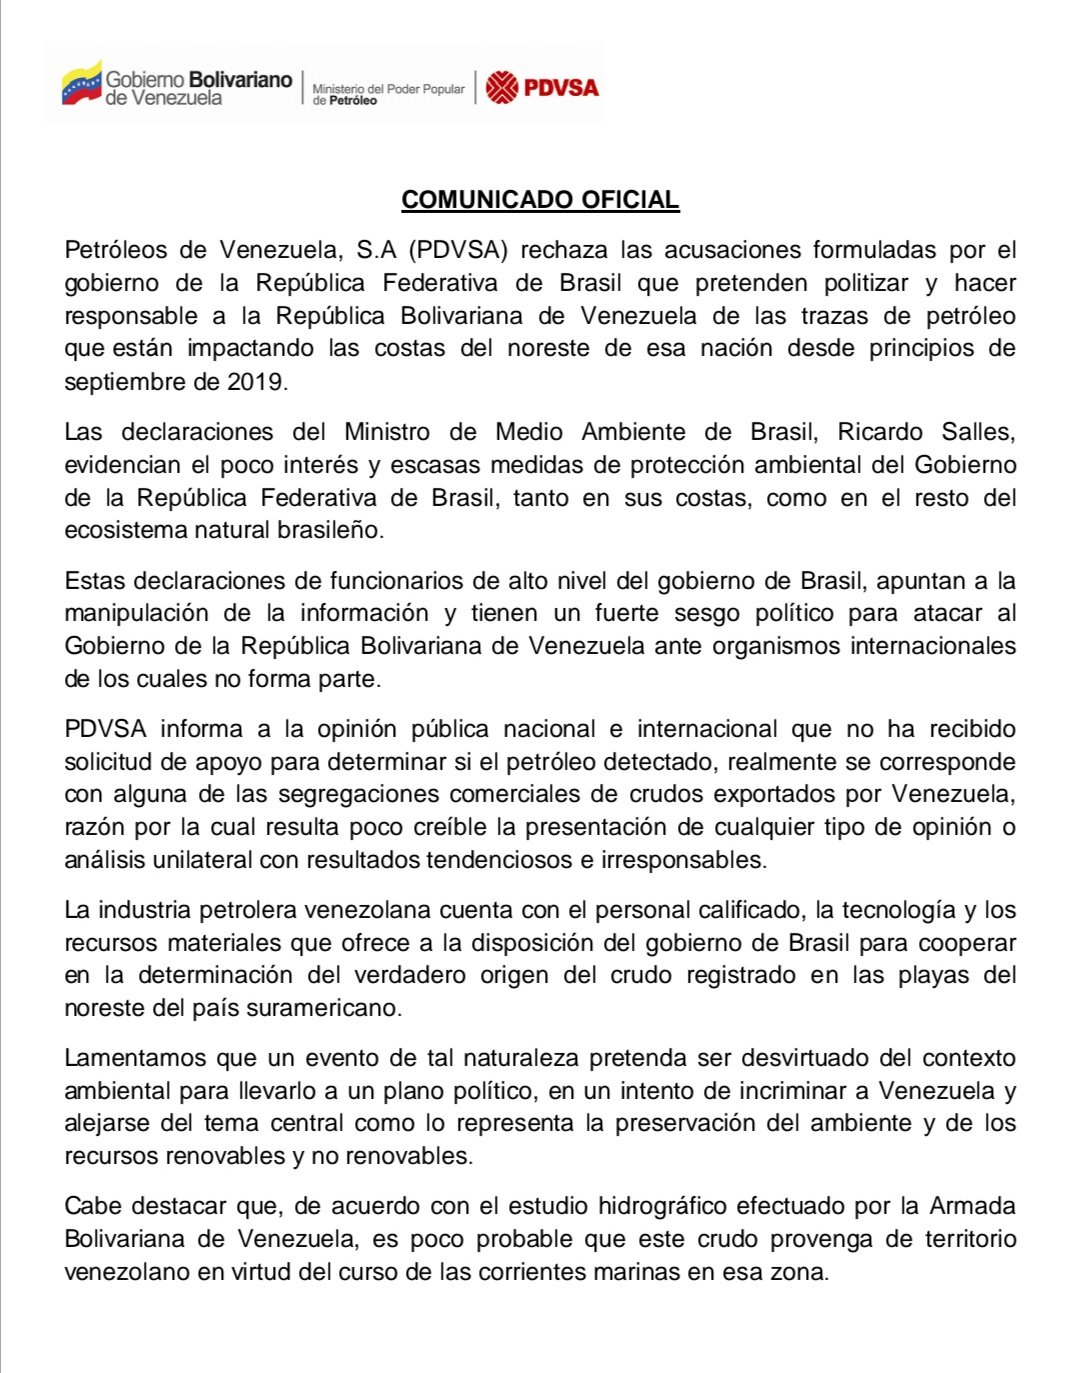 24/10/19 brasil-petróleo-derrame-origen/ tuit